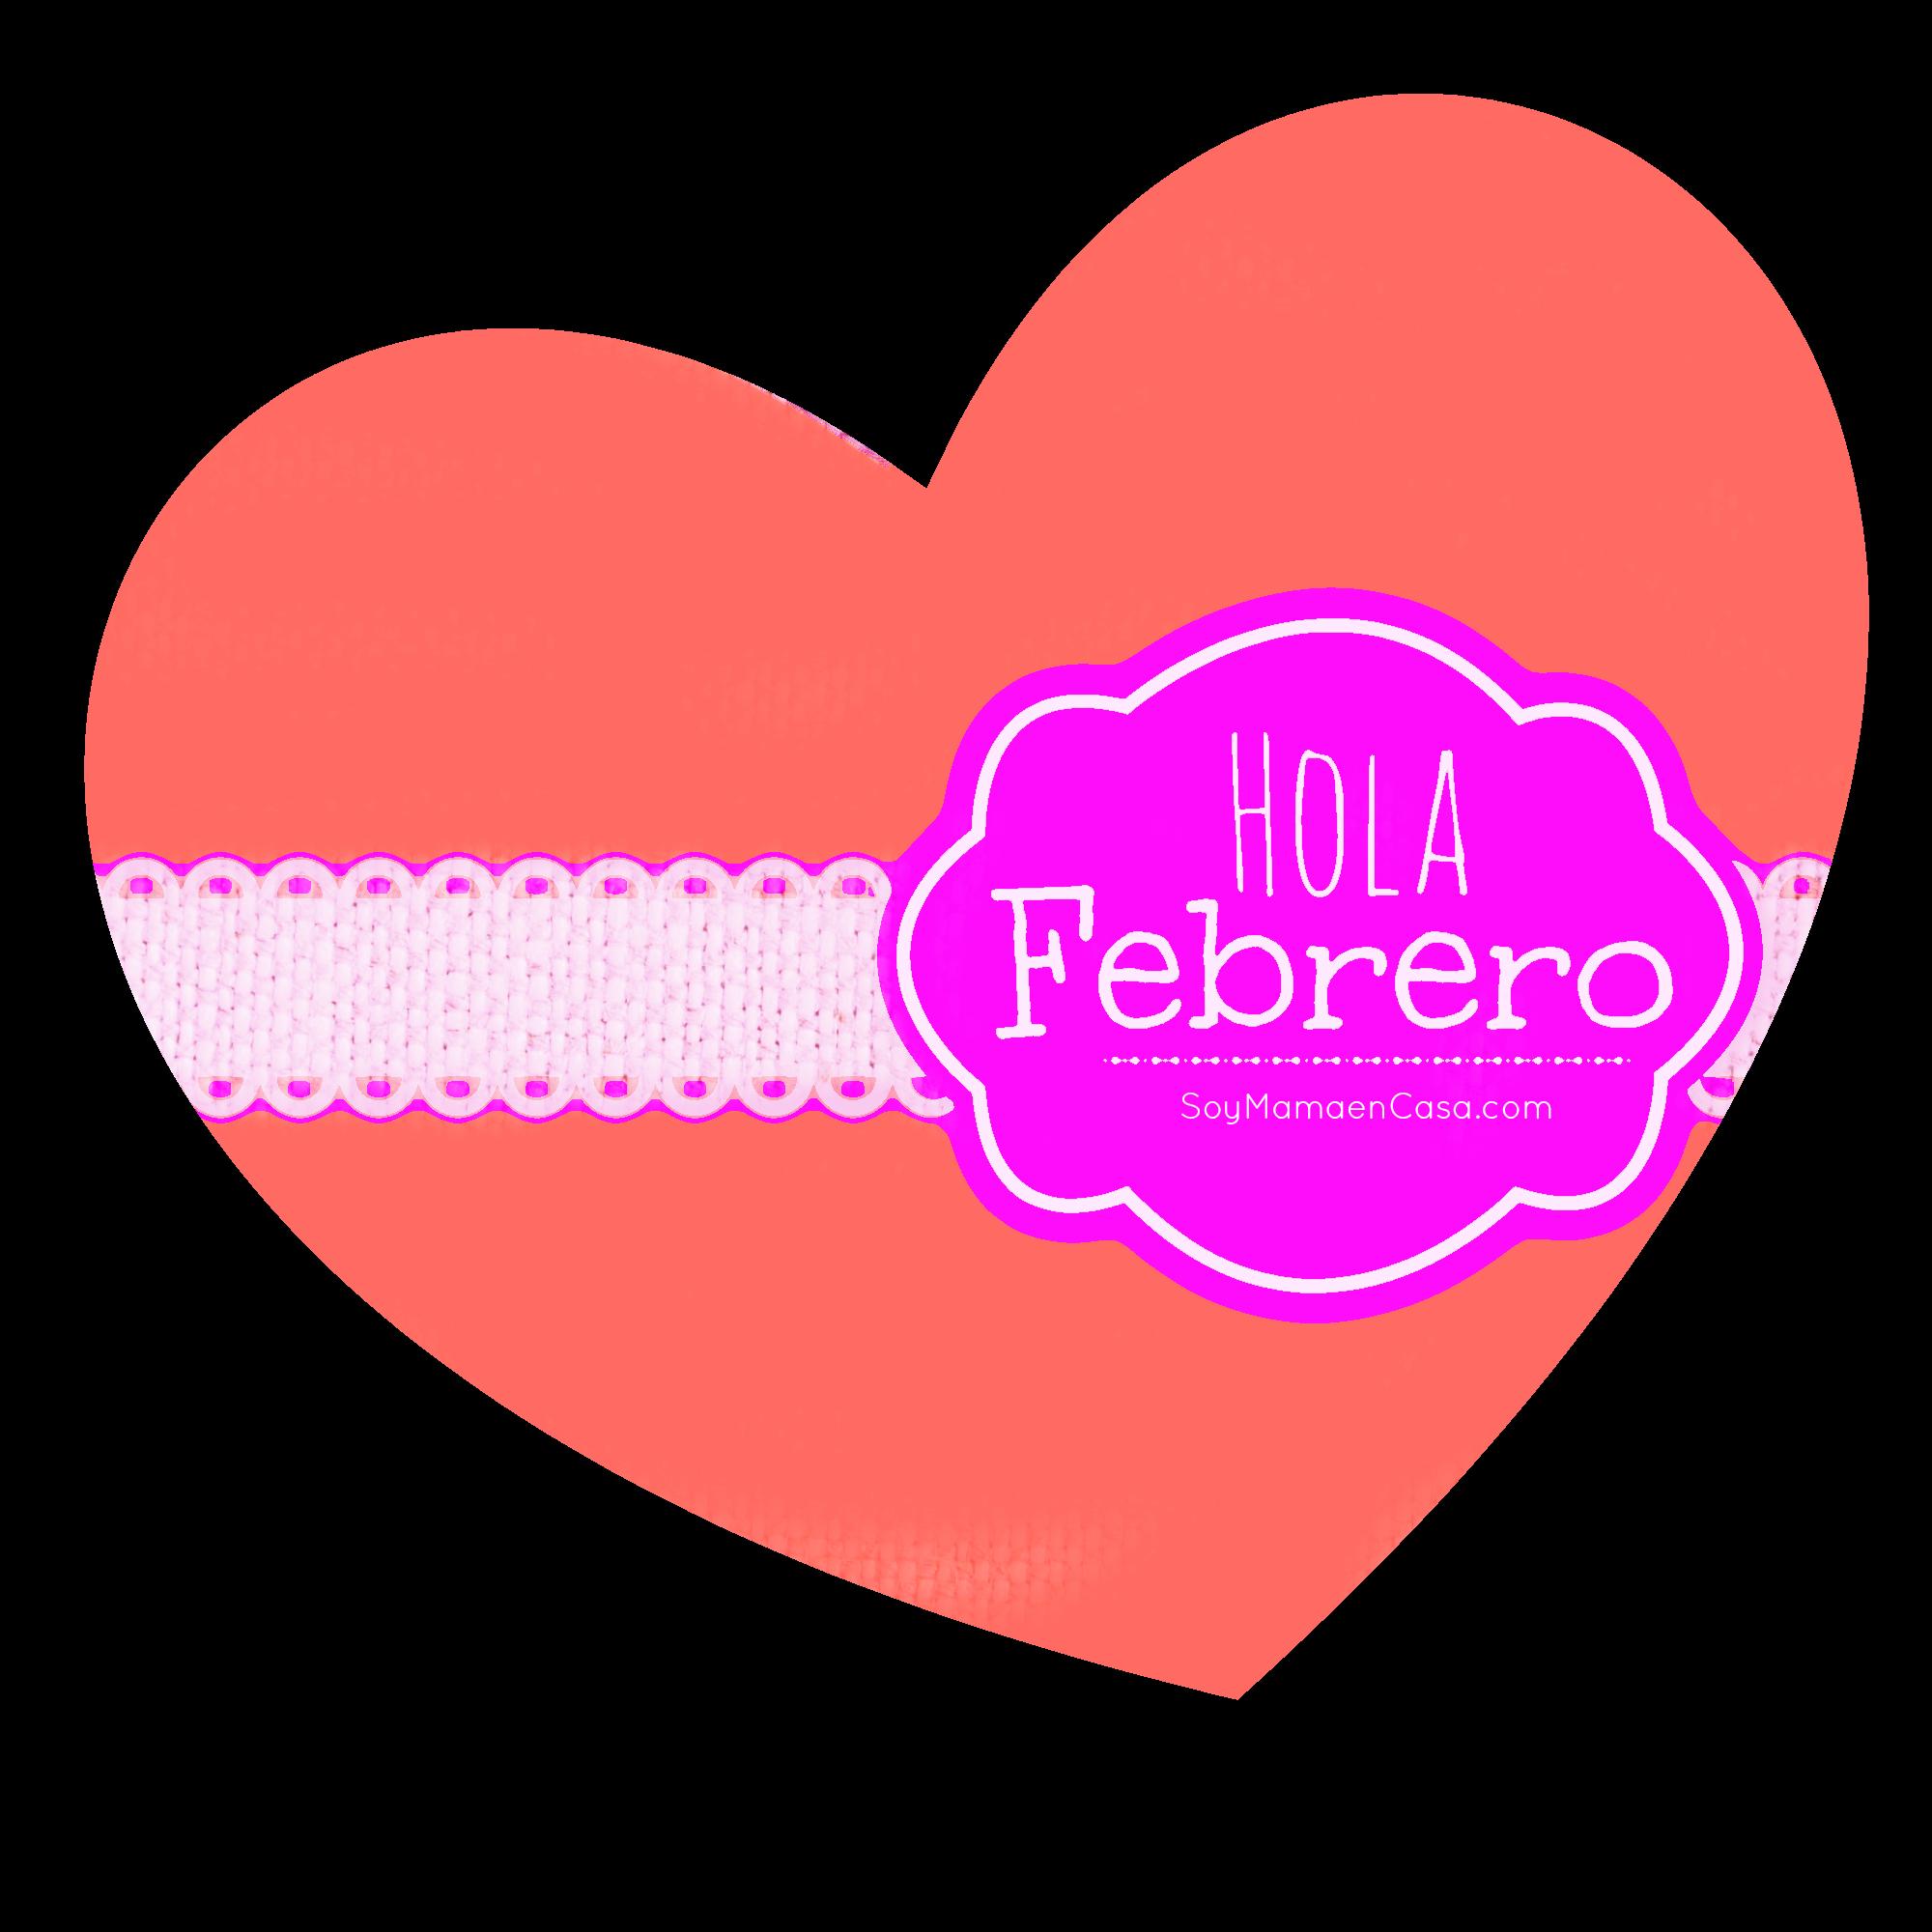 February clipart heart shape design. Hola febrero http soymamaencasa